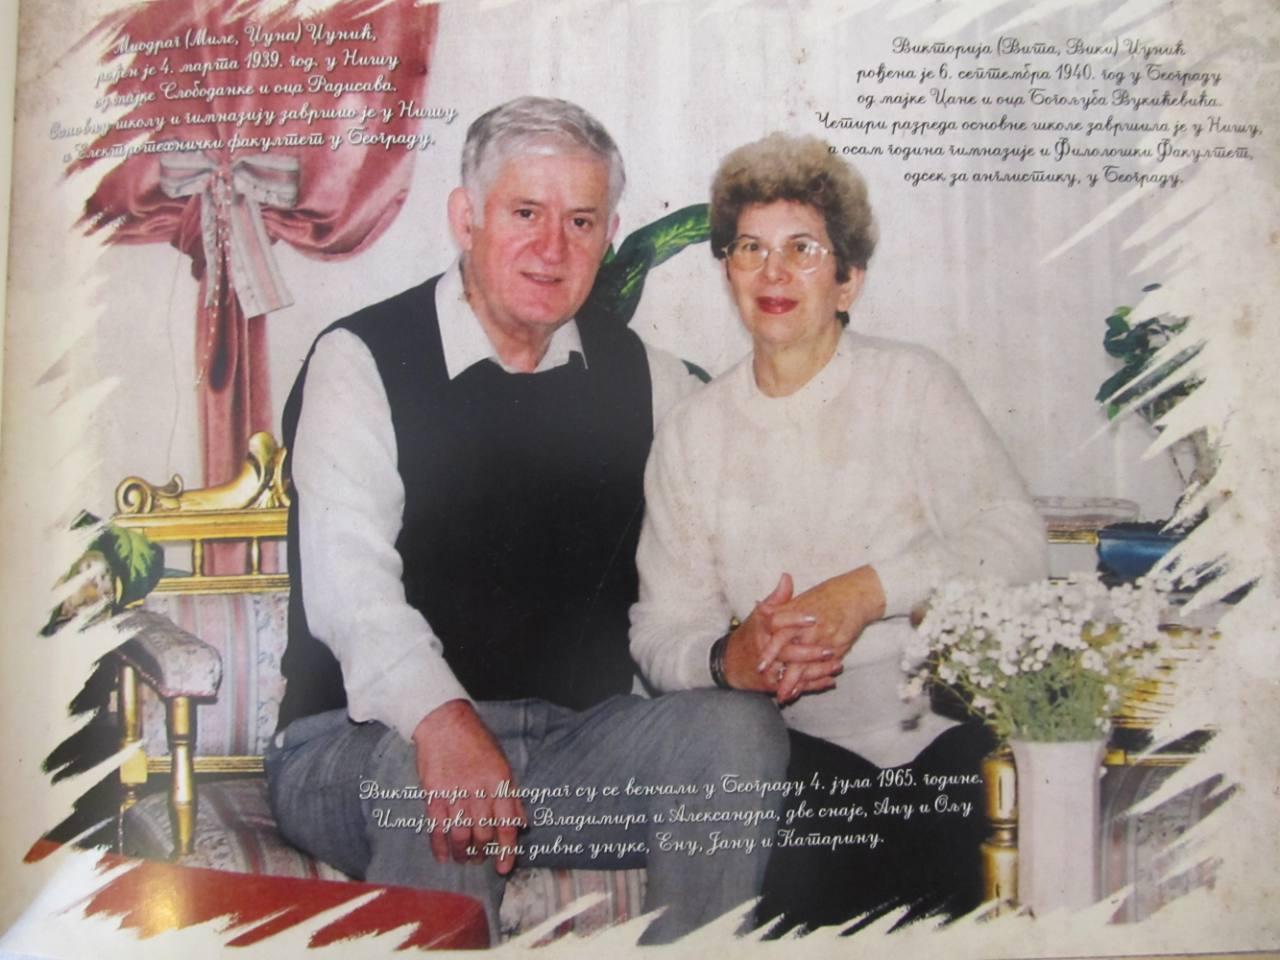 Miodrag i Viktorija Dzunic 088_1280x960